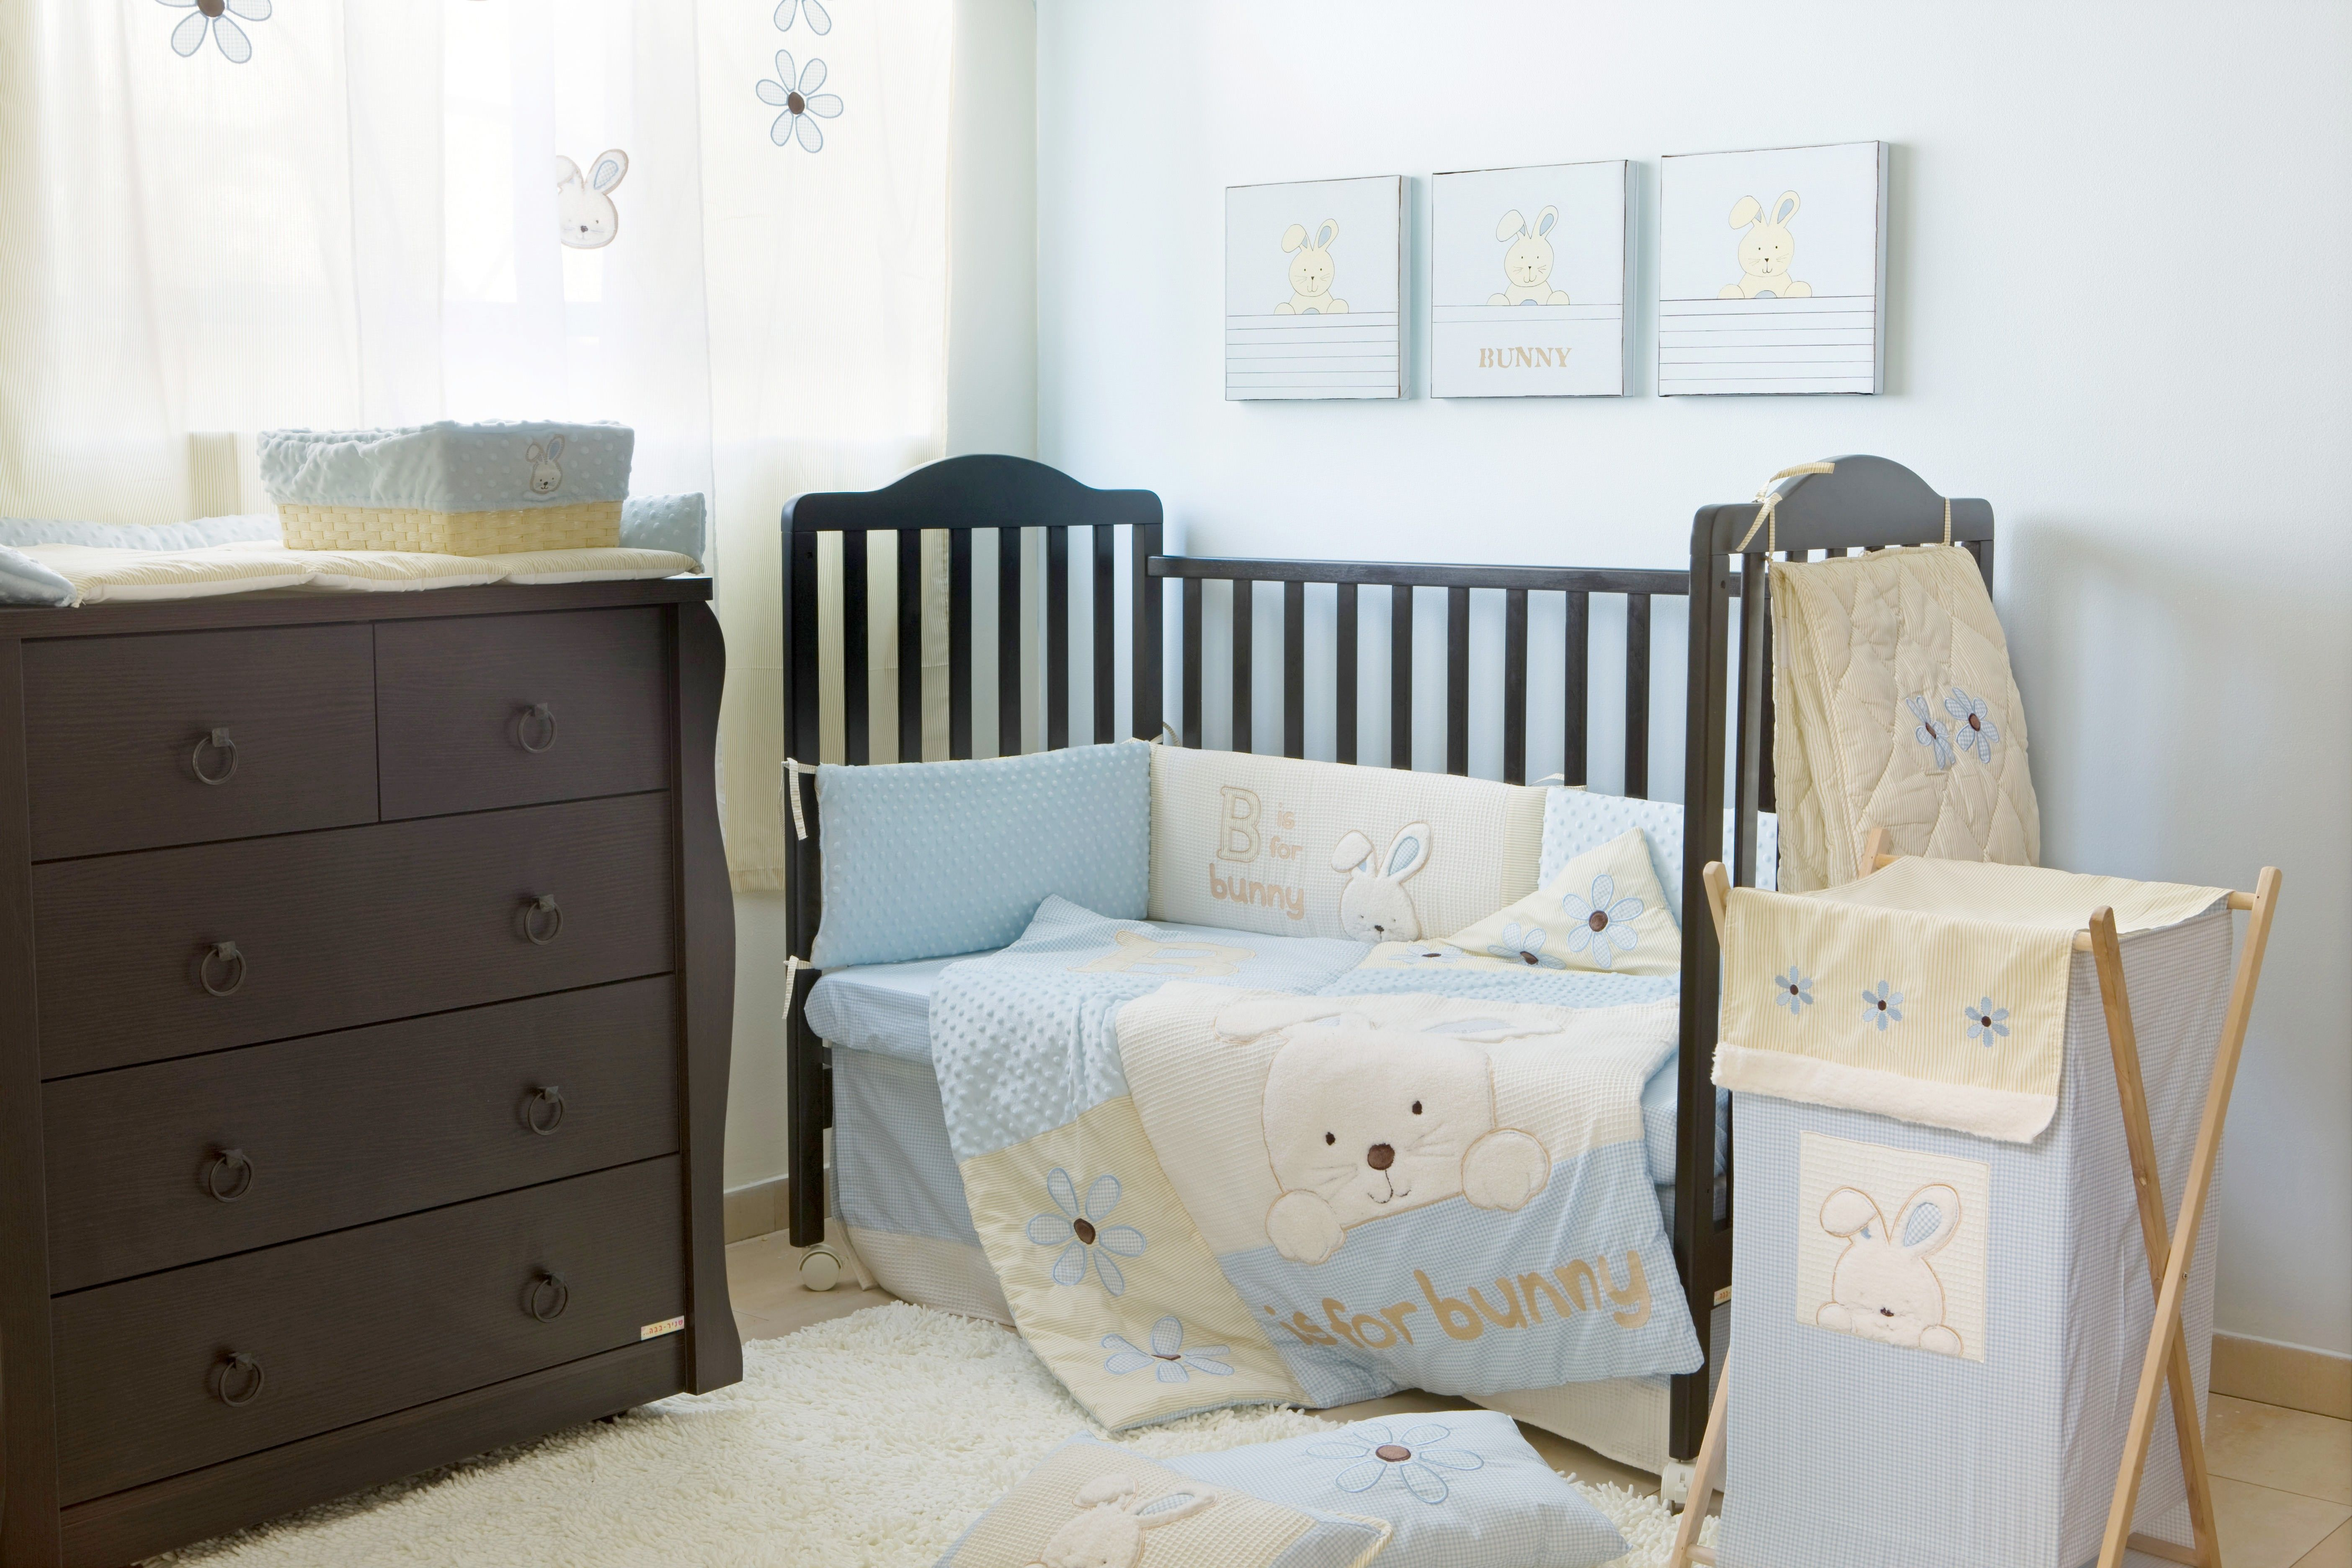 blue bunny crib bedding collection 4 pc crib bedding set. | unisex